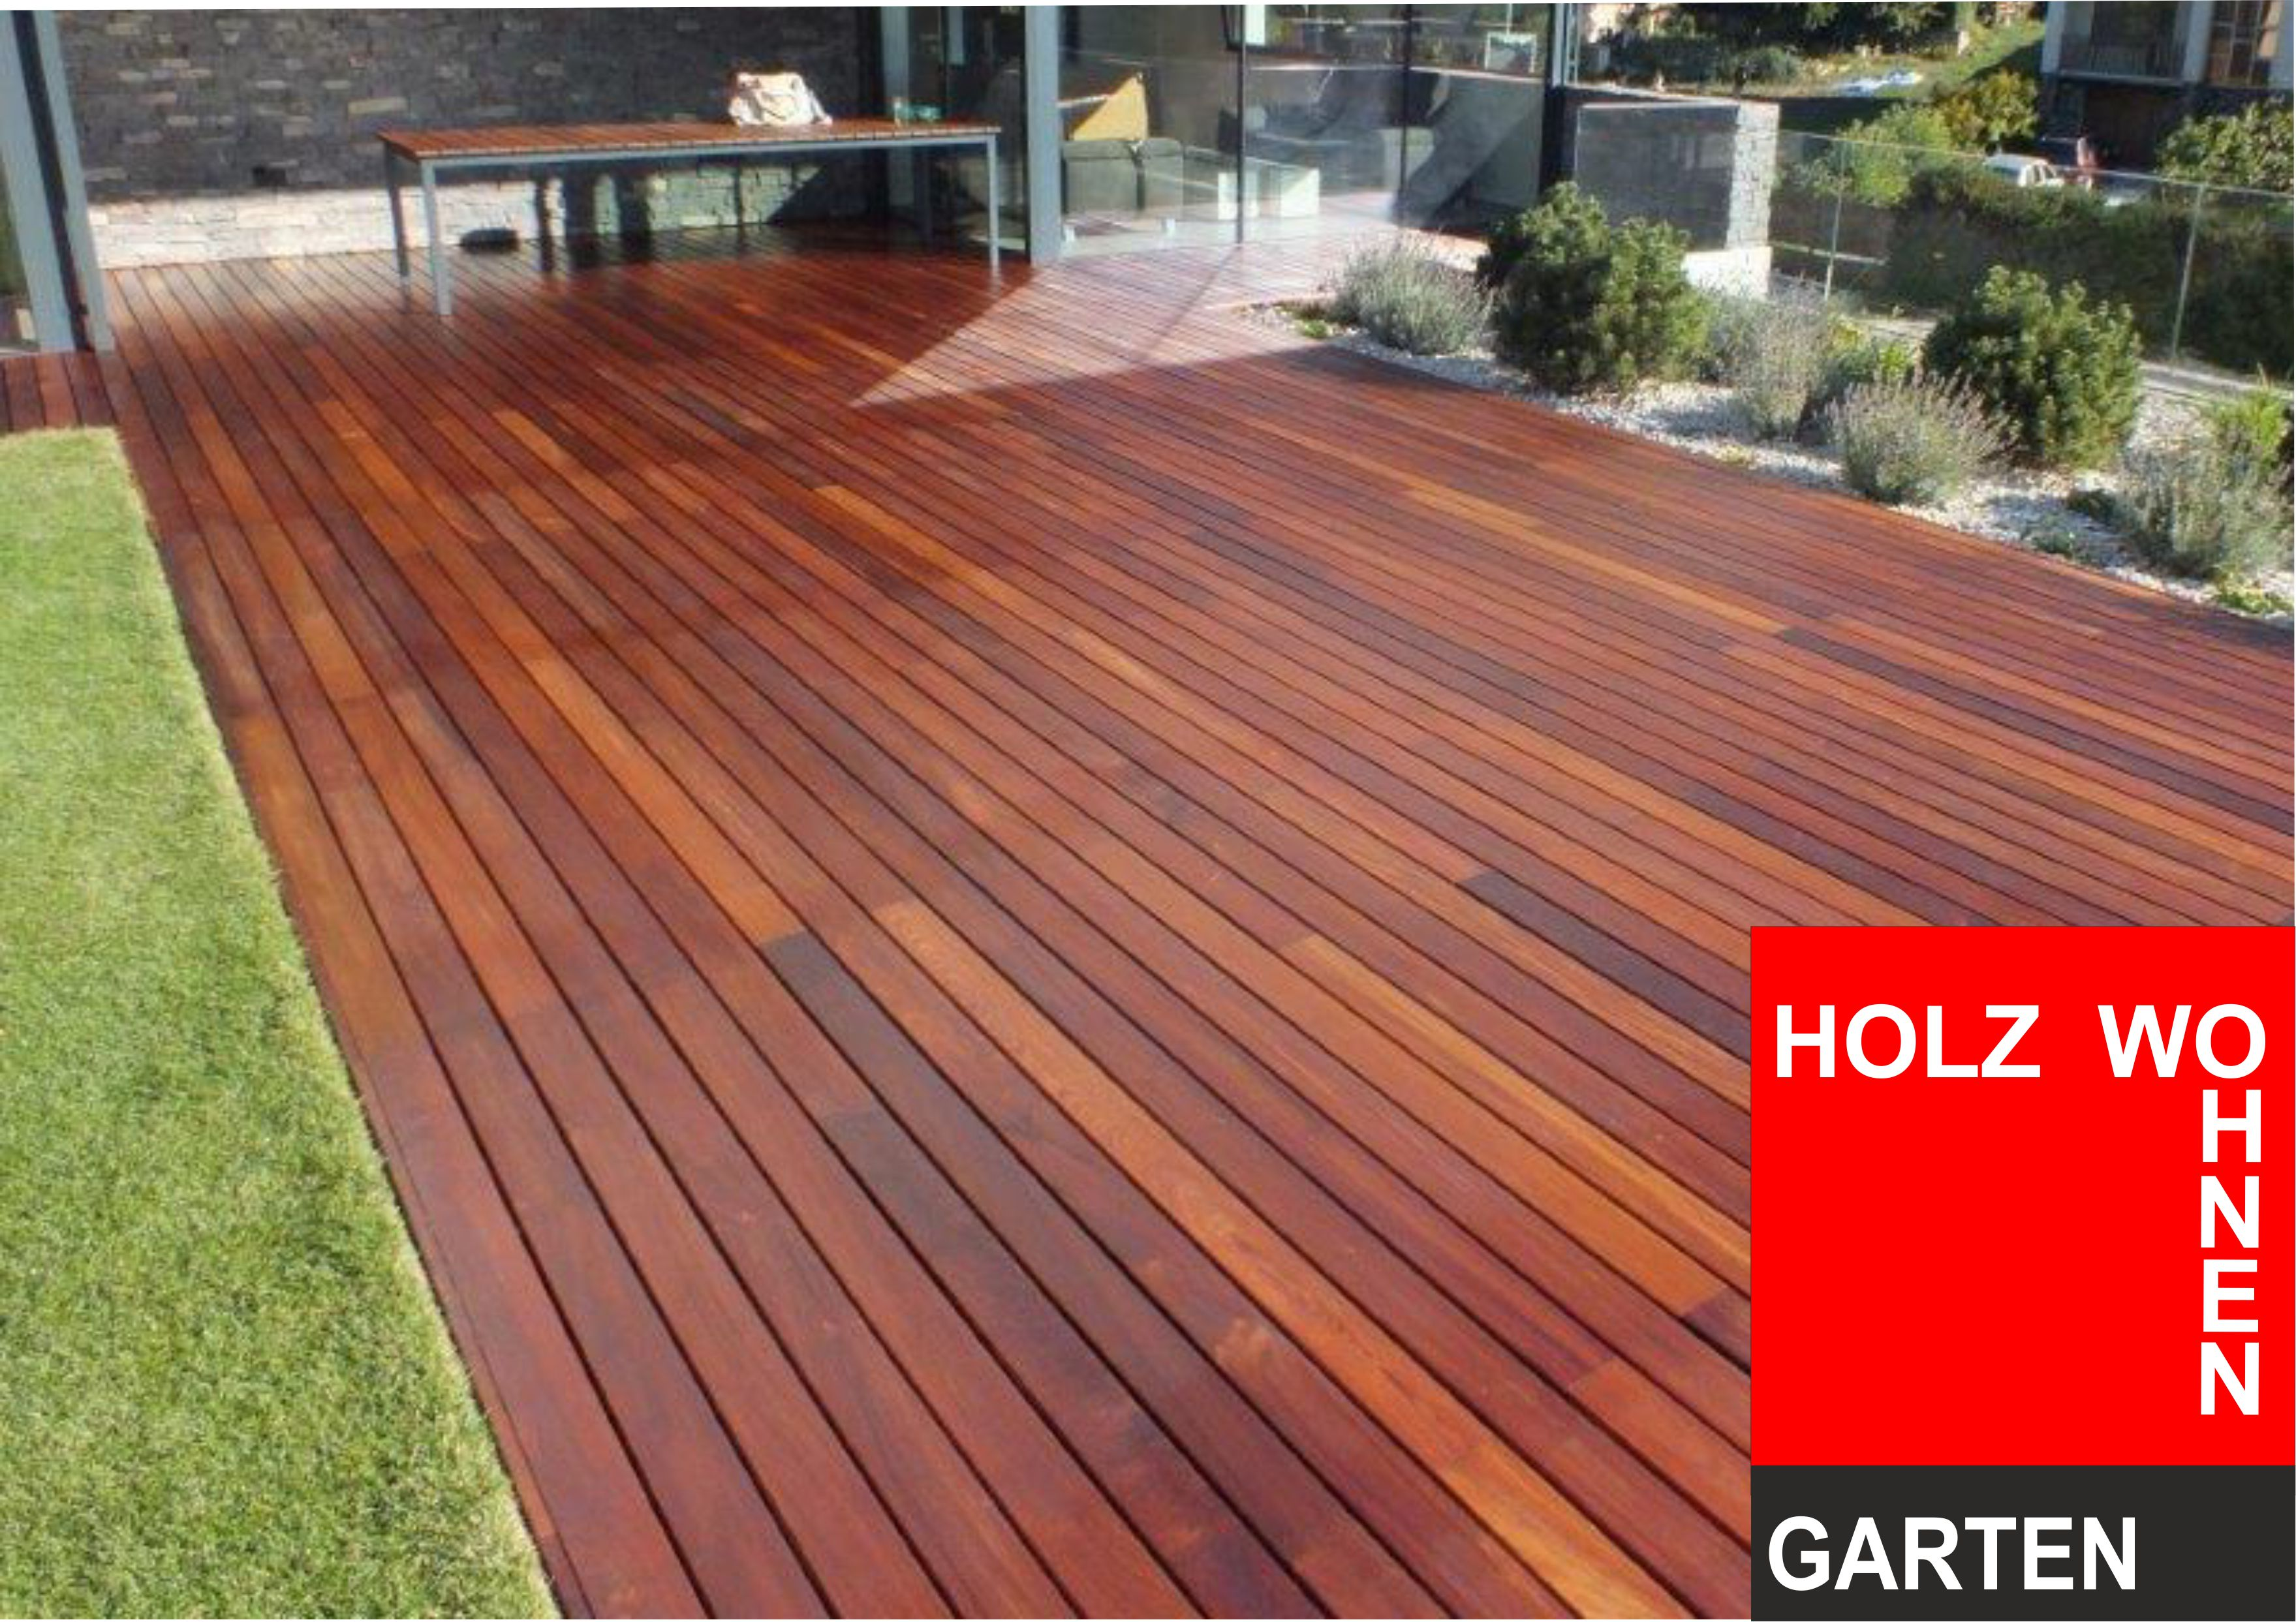 Mukulungu Afri Kulu Terrassendielen Holz Wohnen Garten De